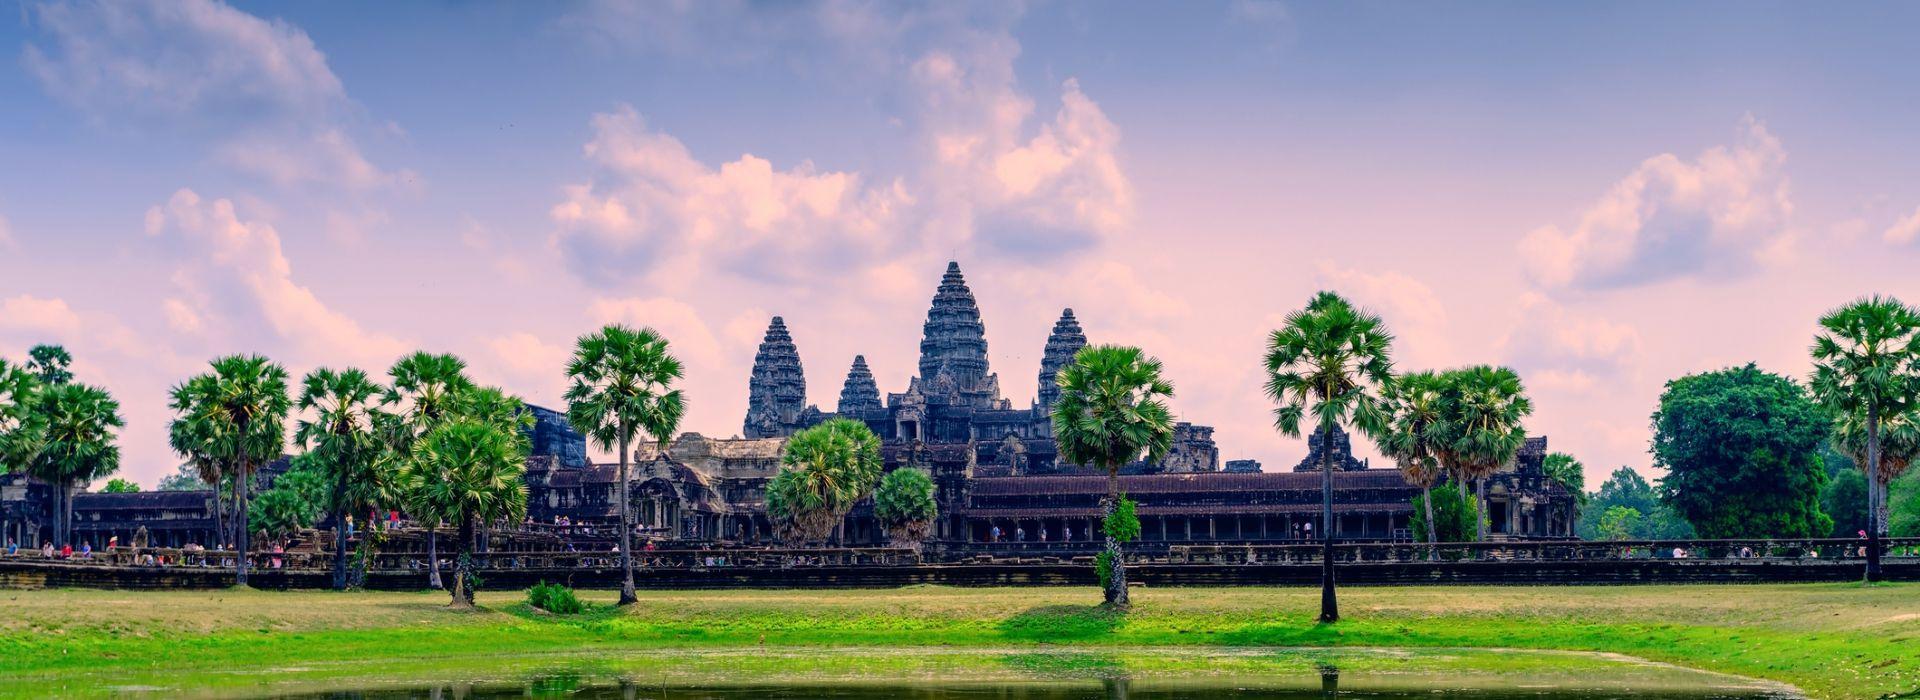 War sites Tours in Phnom Penh